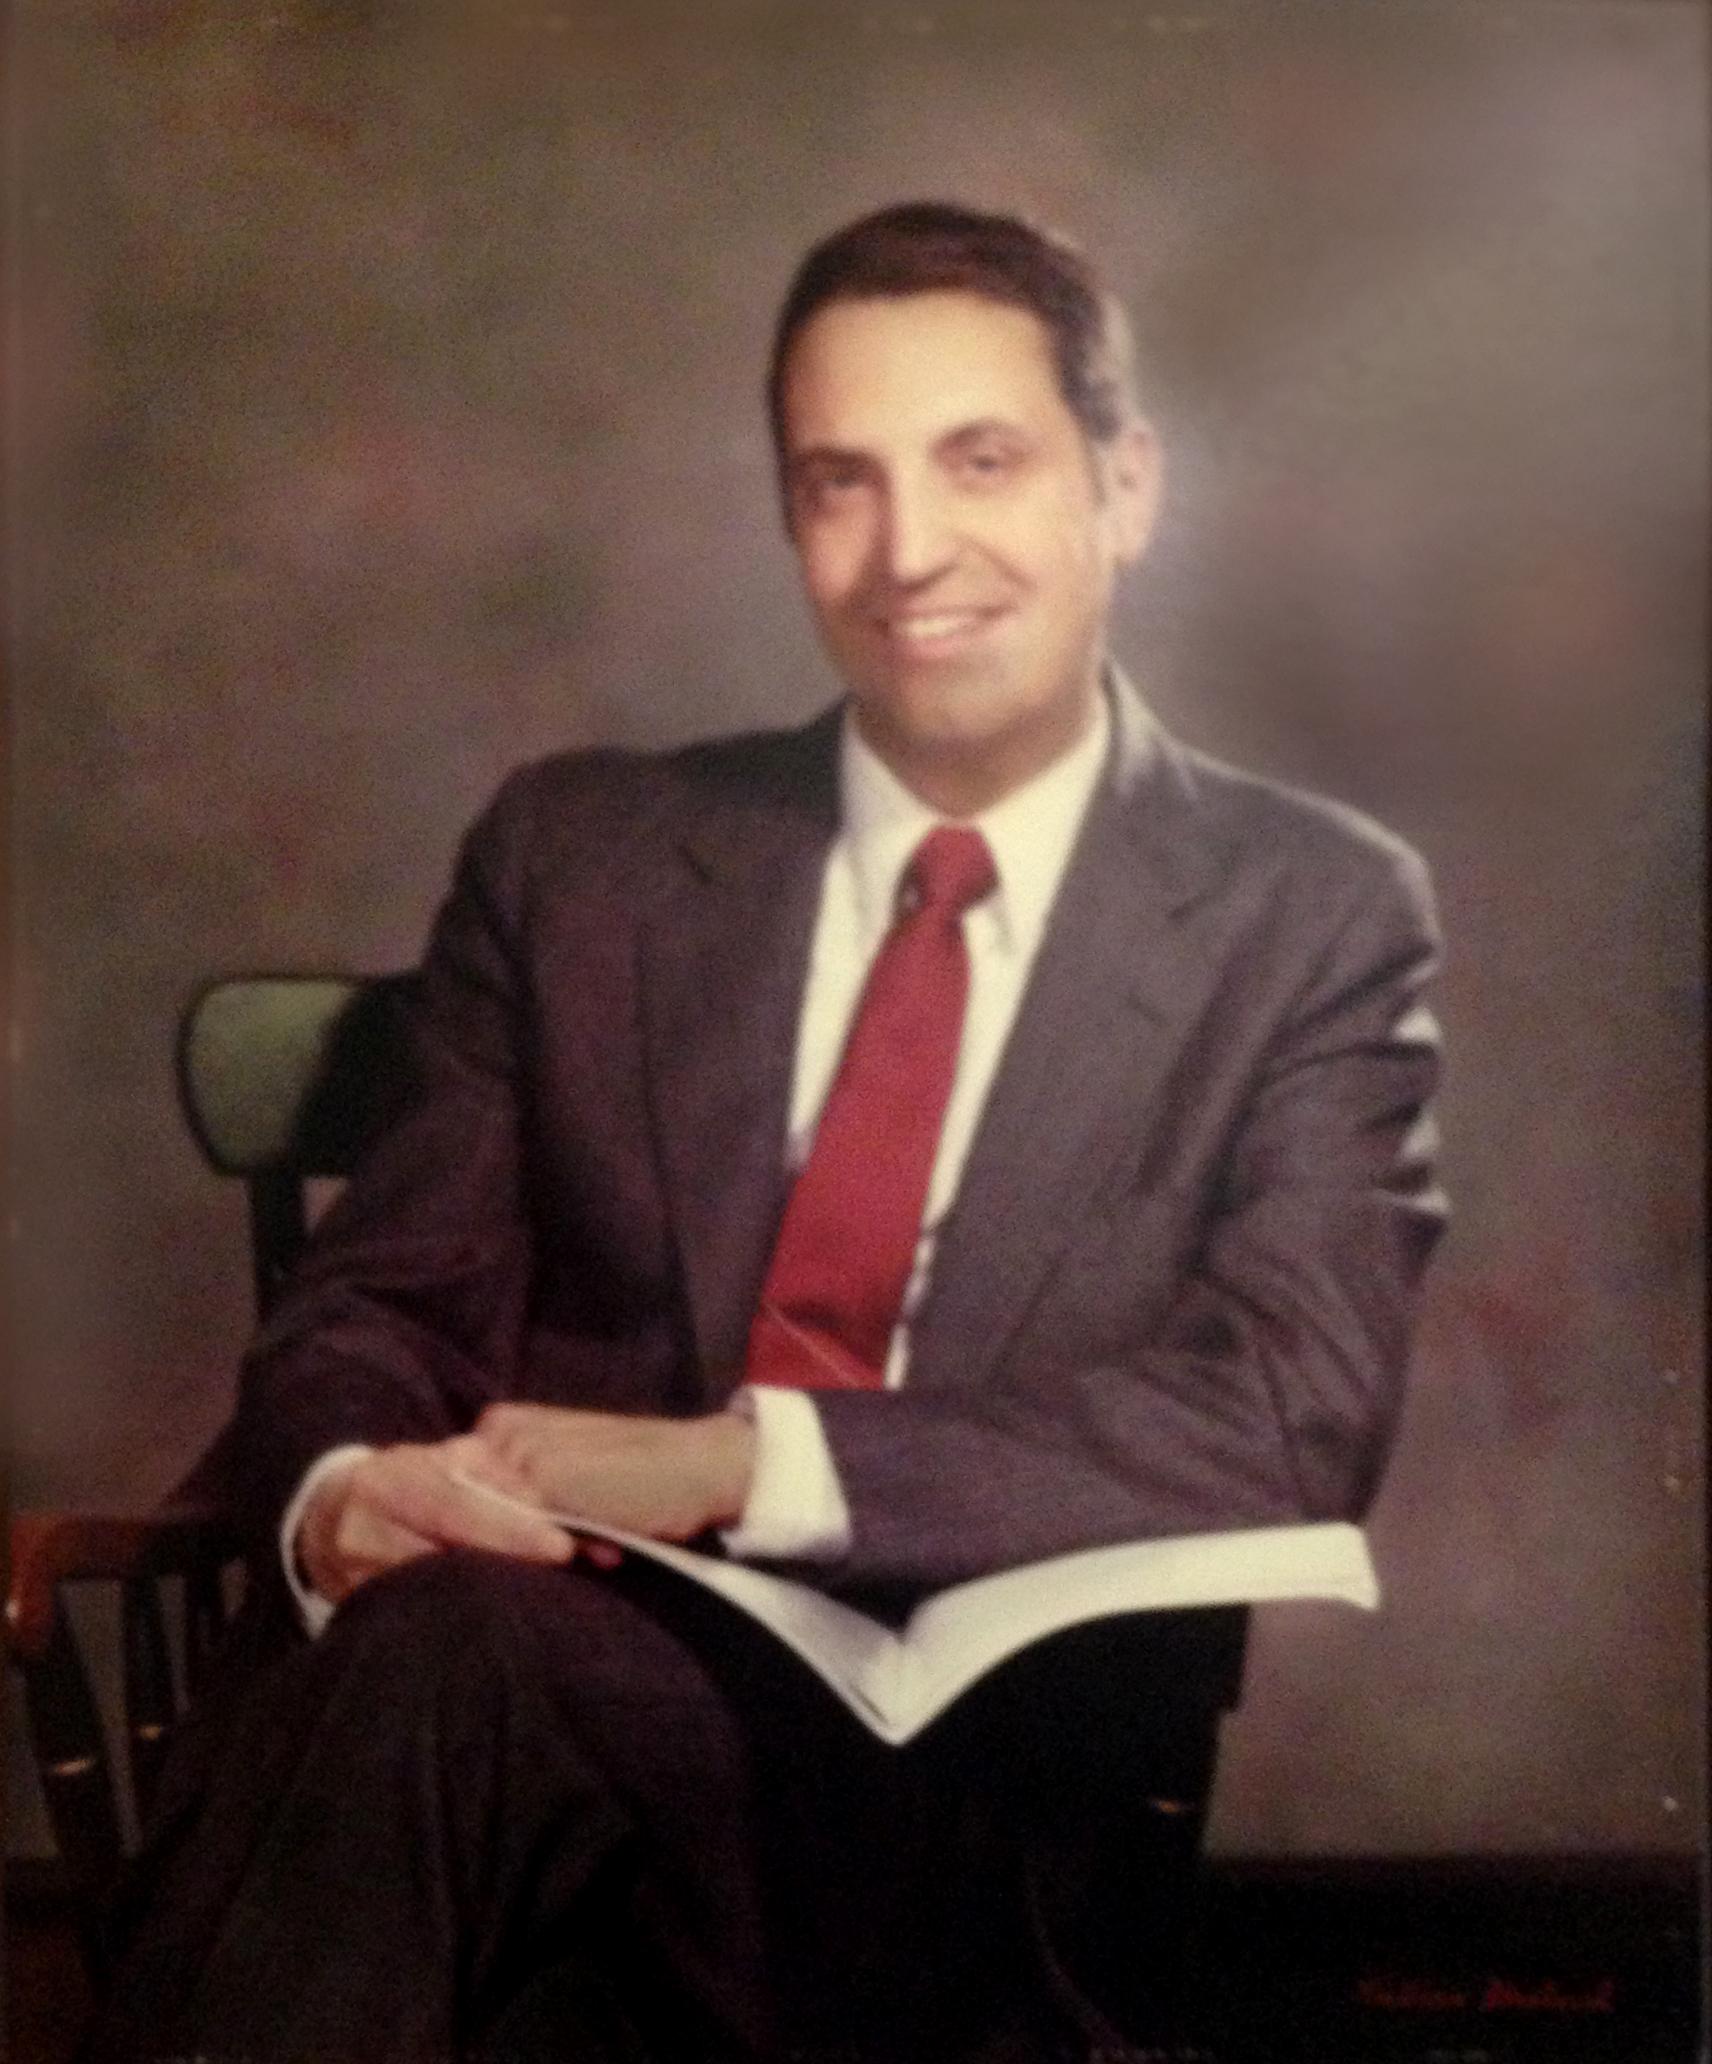 Ronald J. Patten. Dean 1974-1988.